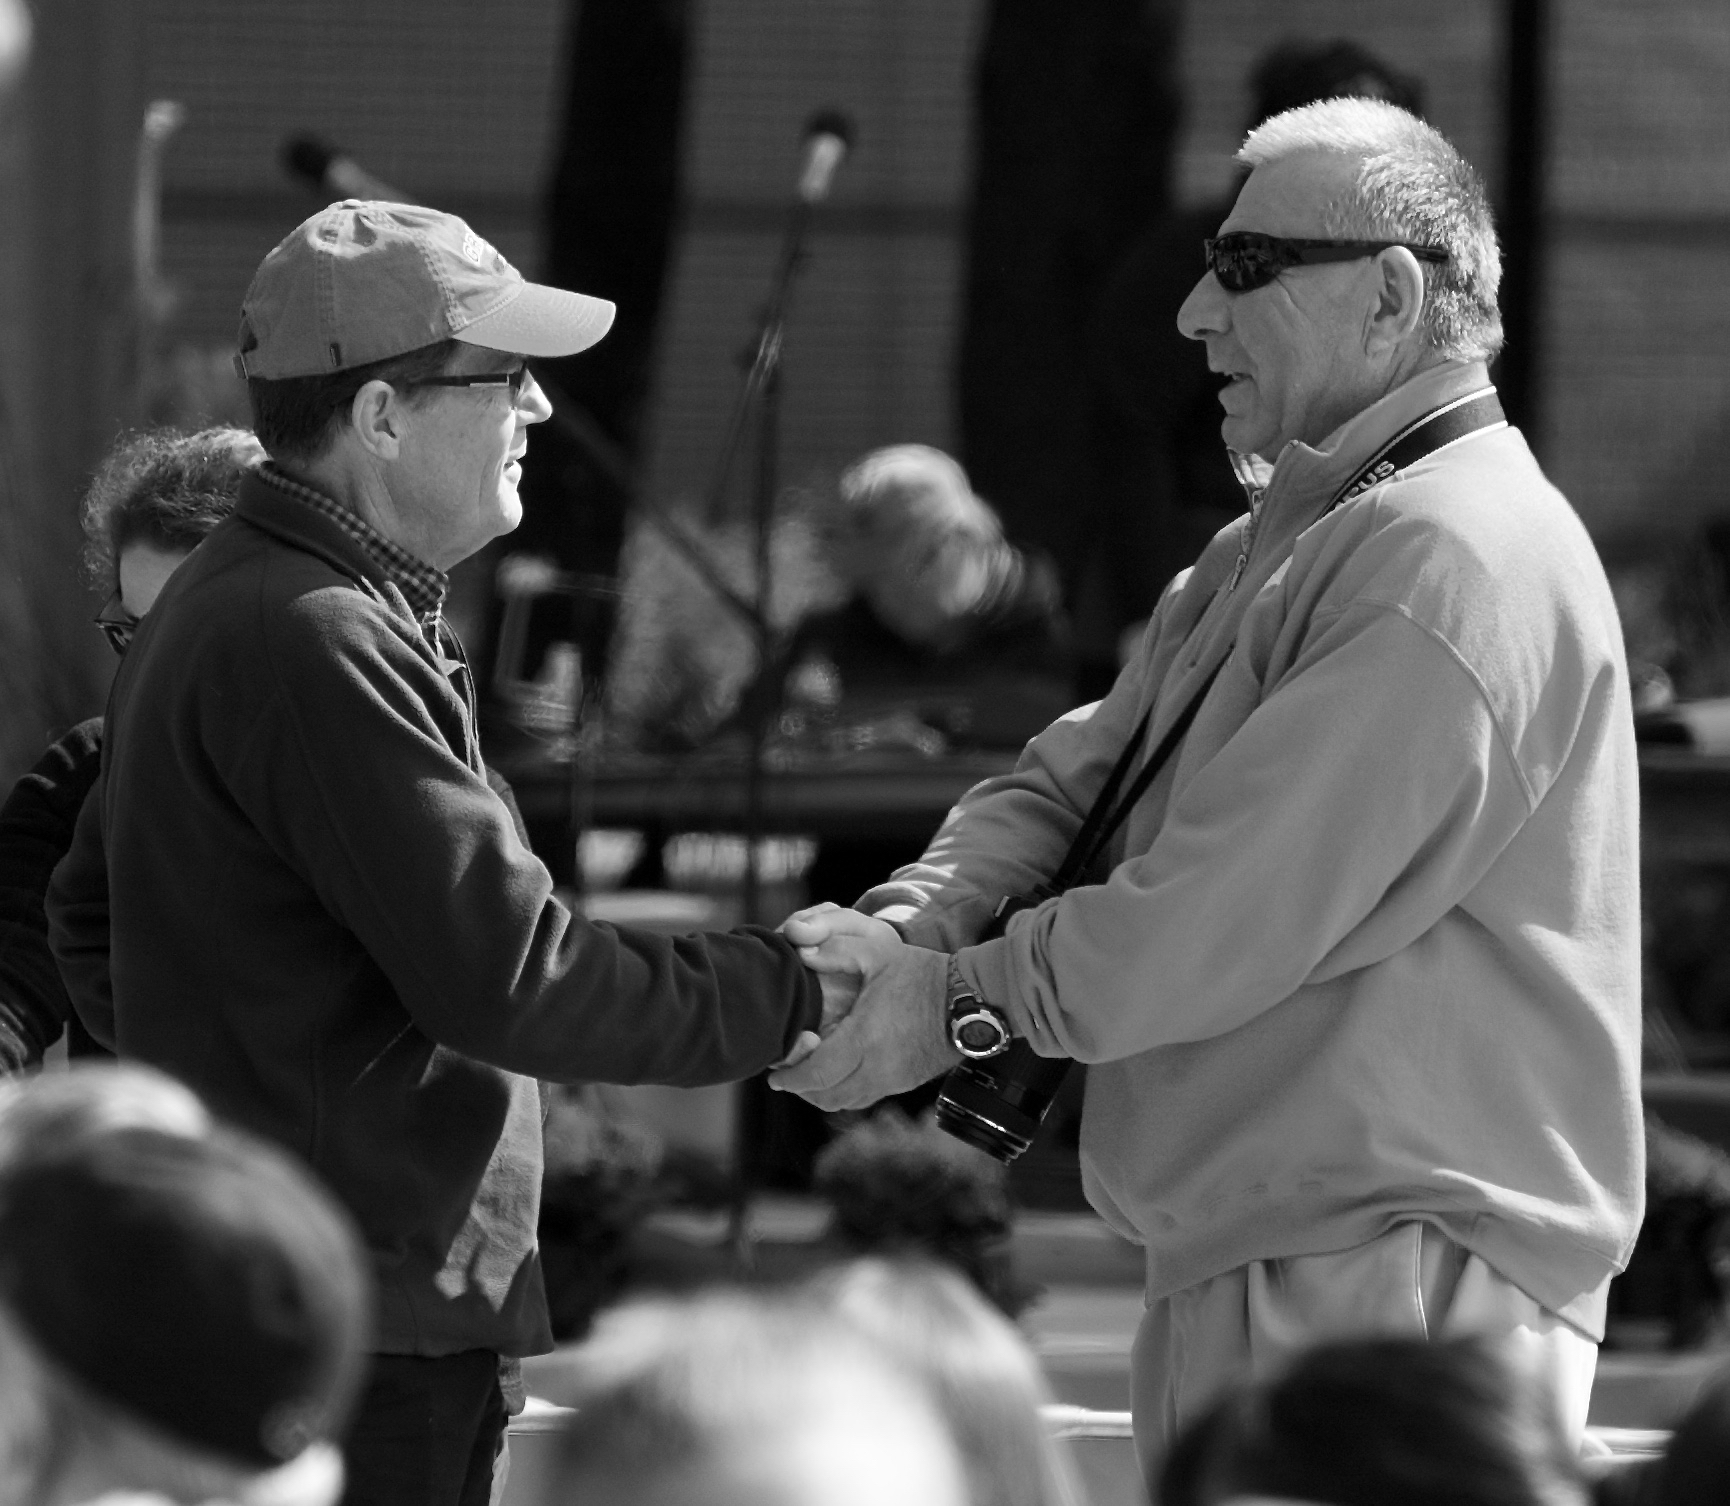 Handshake. Grinnell College. Grinnell, Iowa. May 2015. © William D. Walker